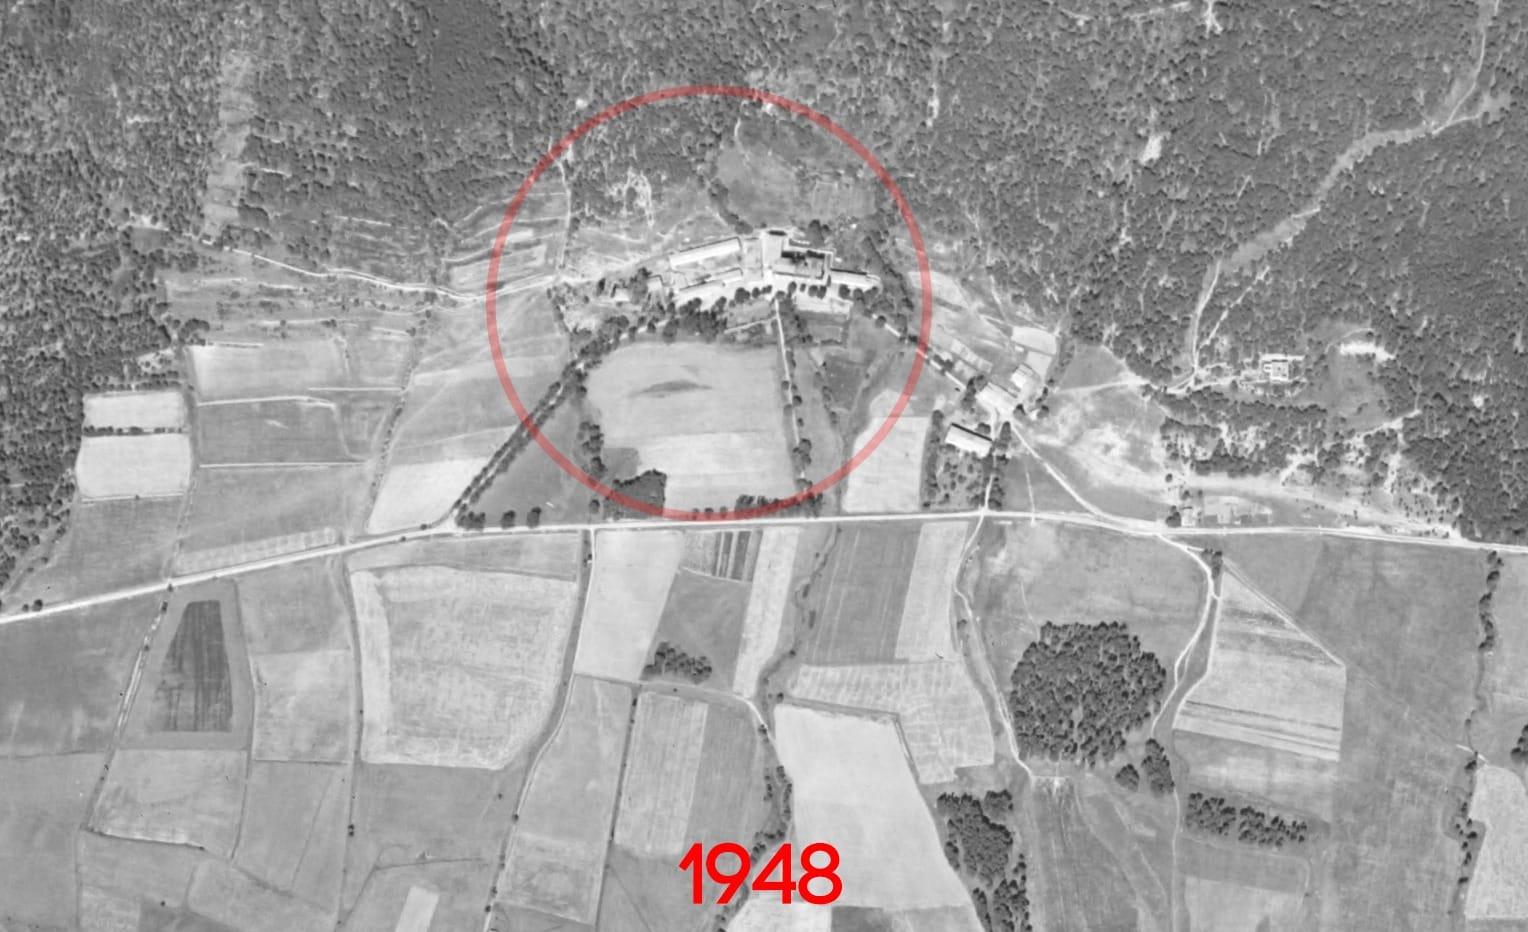 hopital-felix-zehetner-before-map-1948